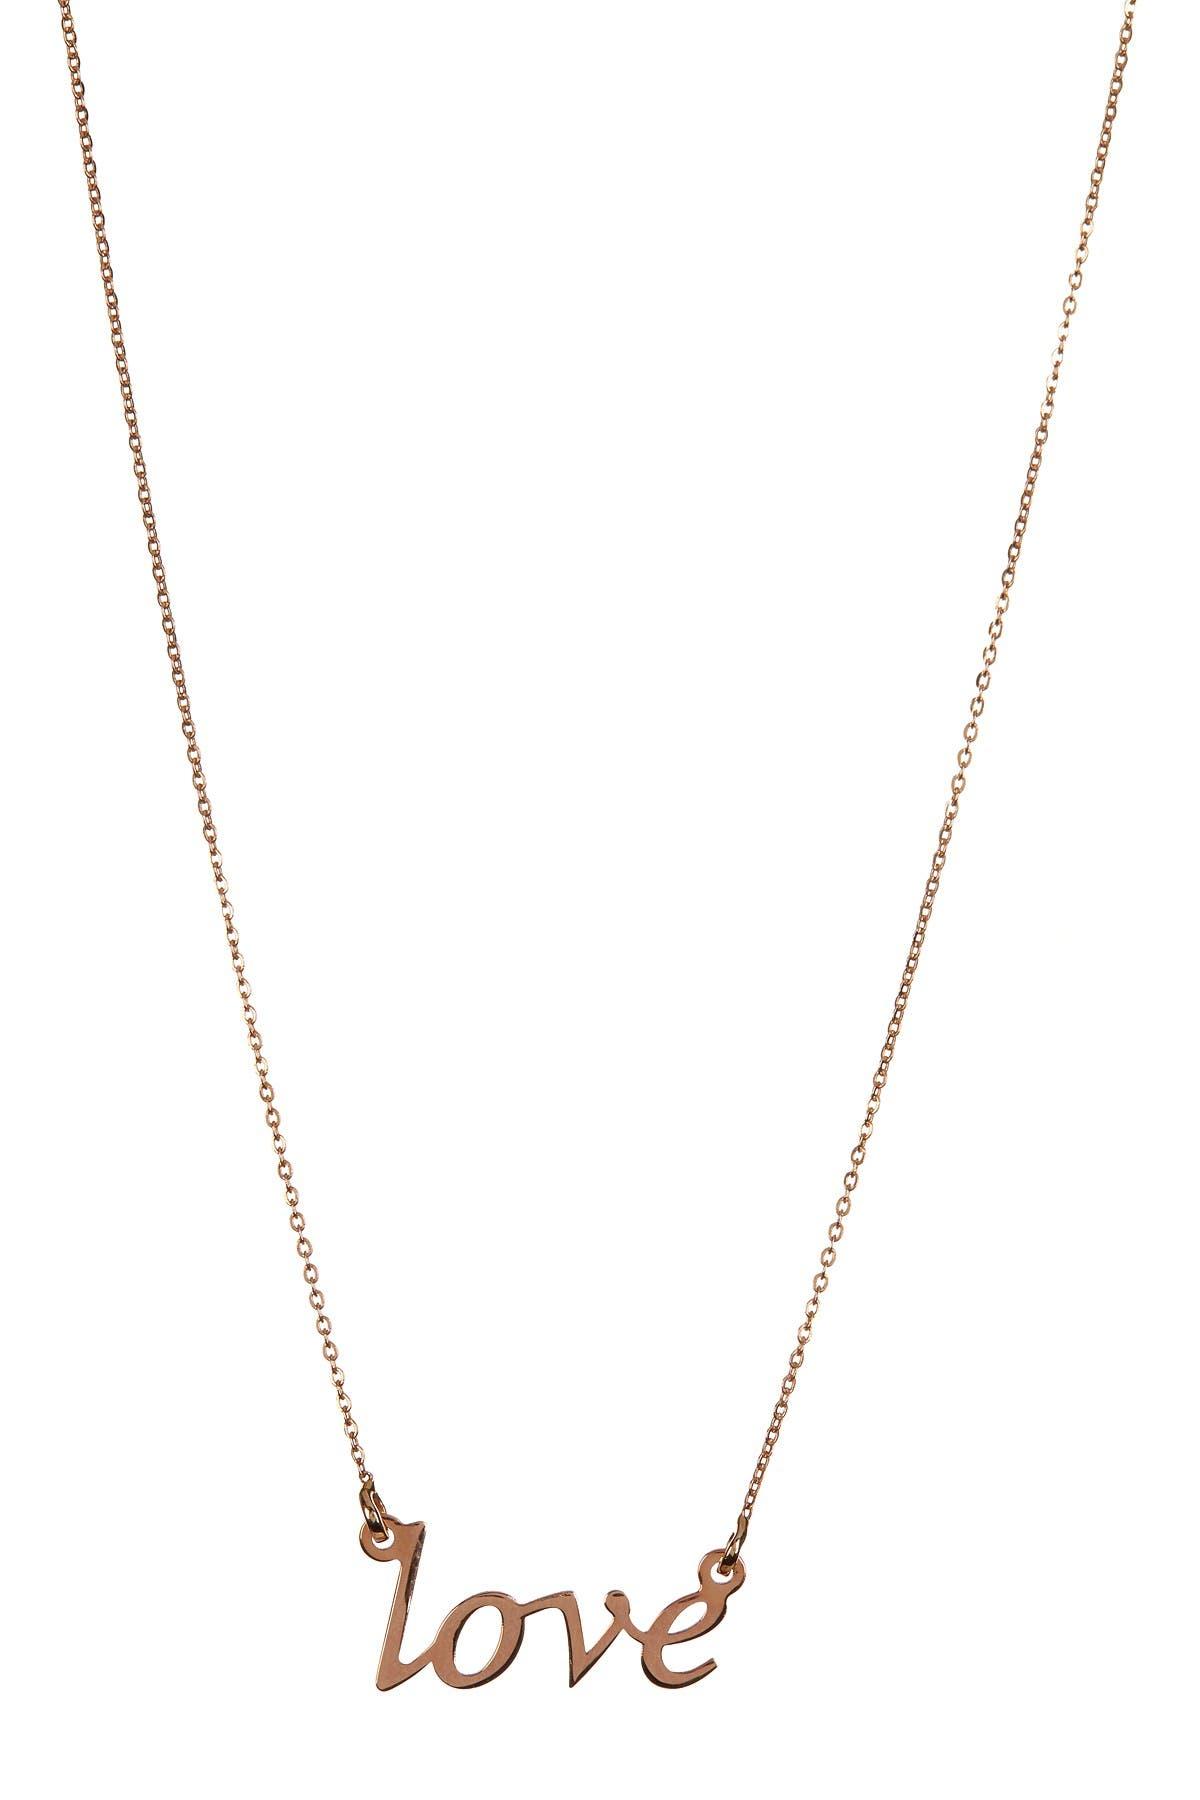 Image of KARAT RUSH 14K Rose Gold Shiny 'Love' Necklace